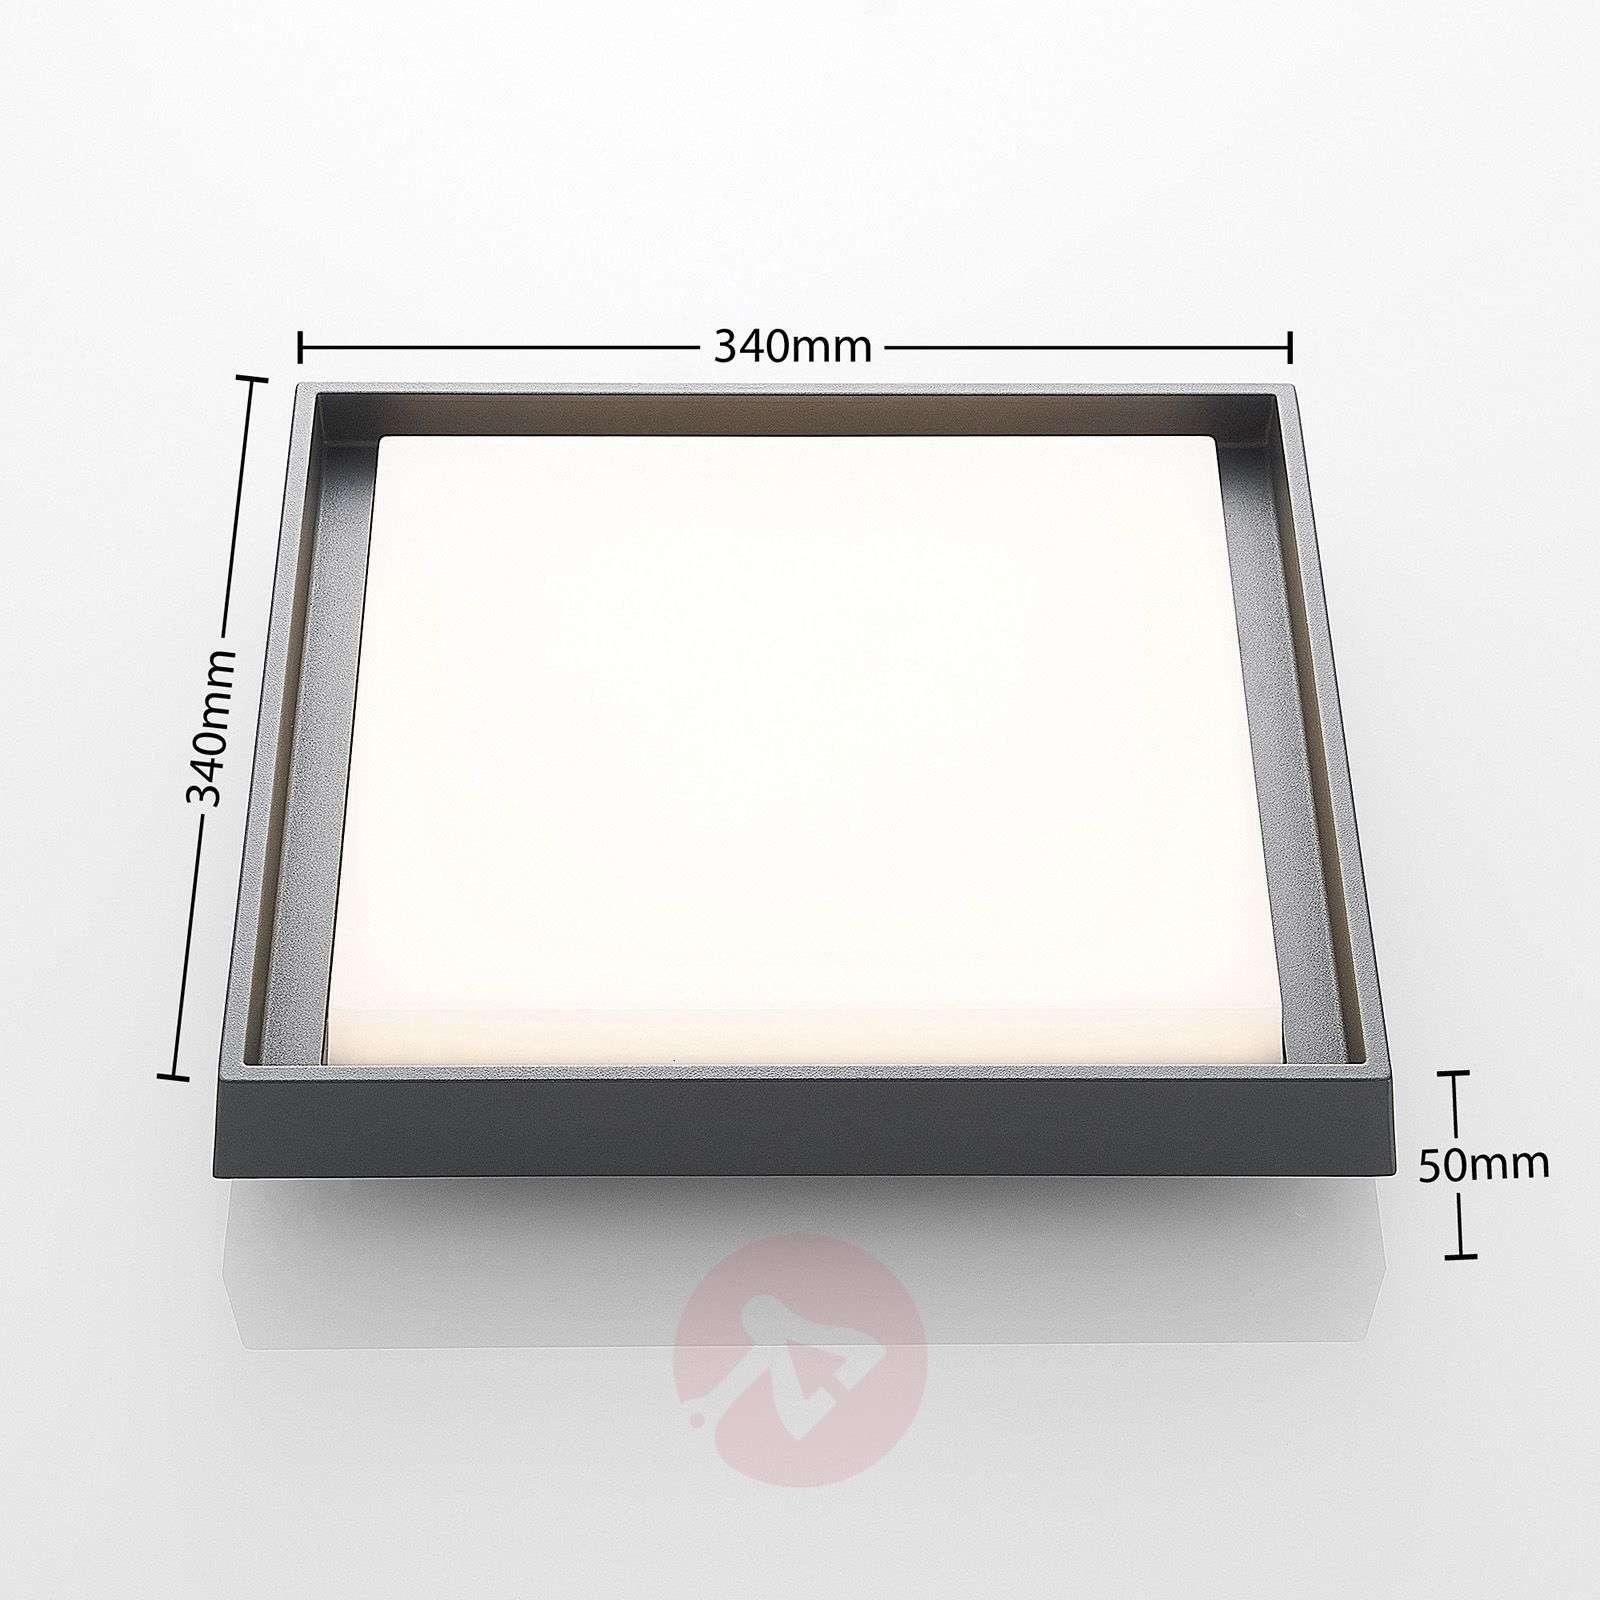 Birta LED outdoor ceiling light, angular, 34 cm-9969130-02